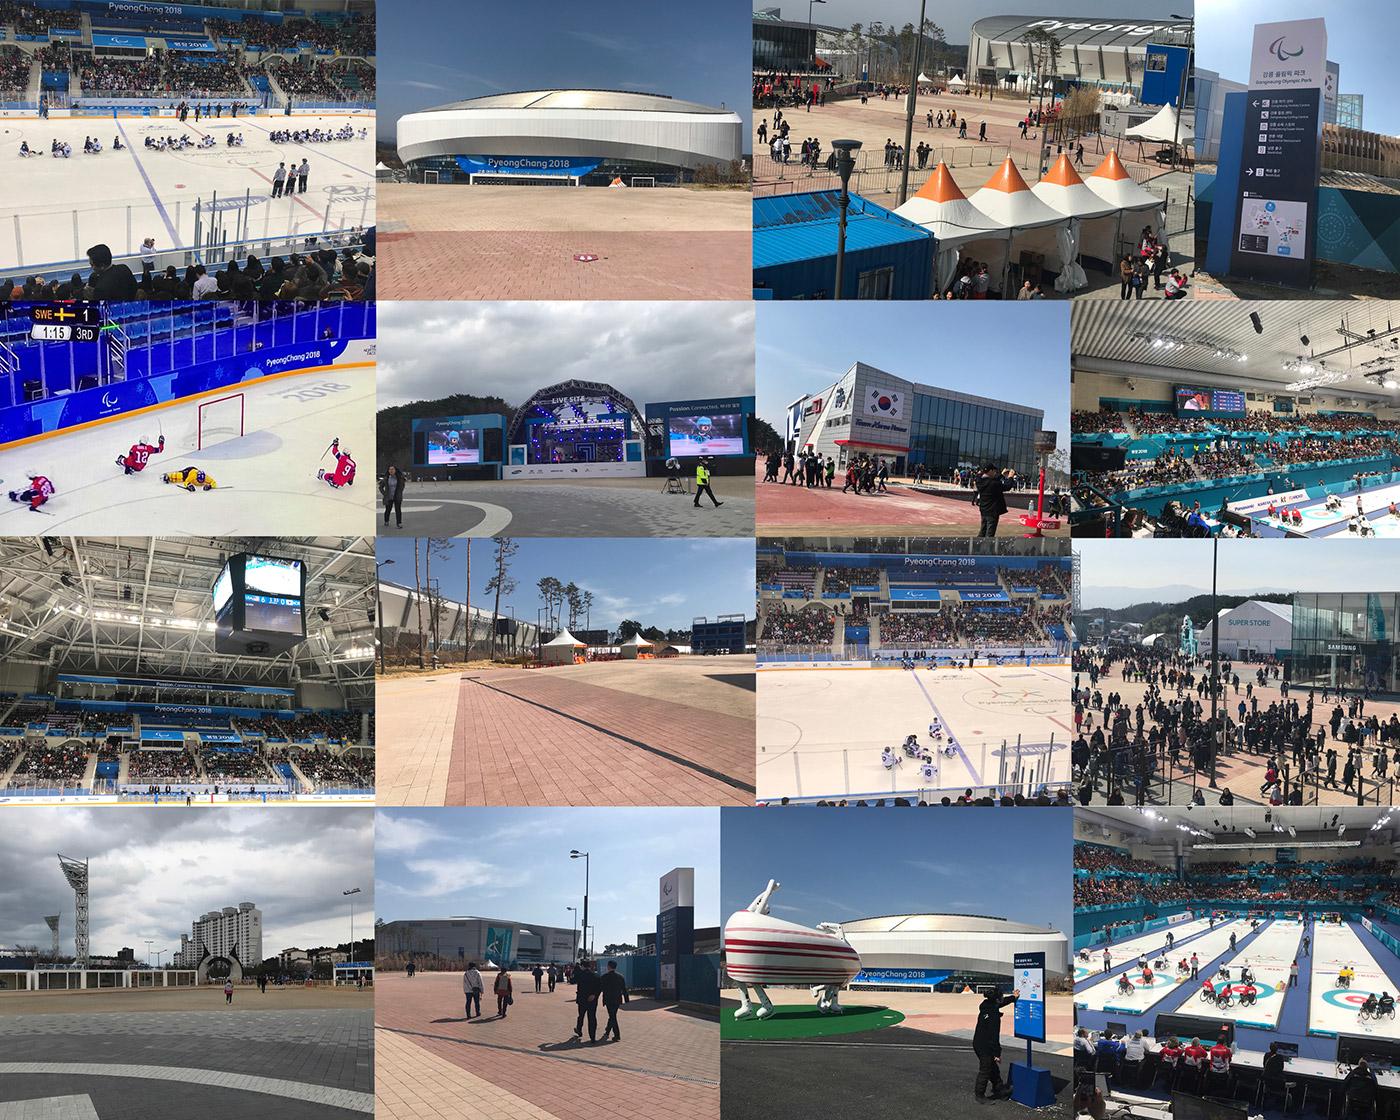 PyeongChang Paralympics 2018 Photo Montage 5 - Gangneung Coastal Cluster